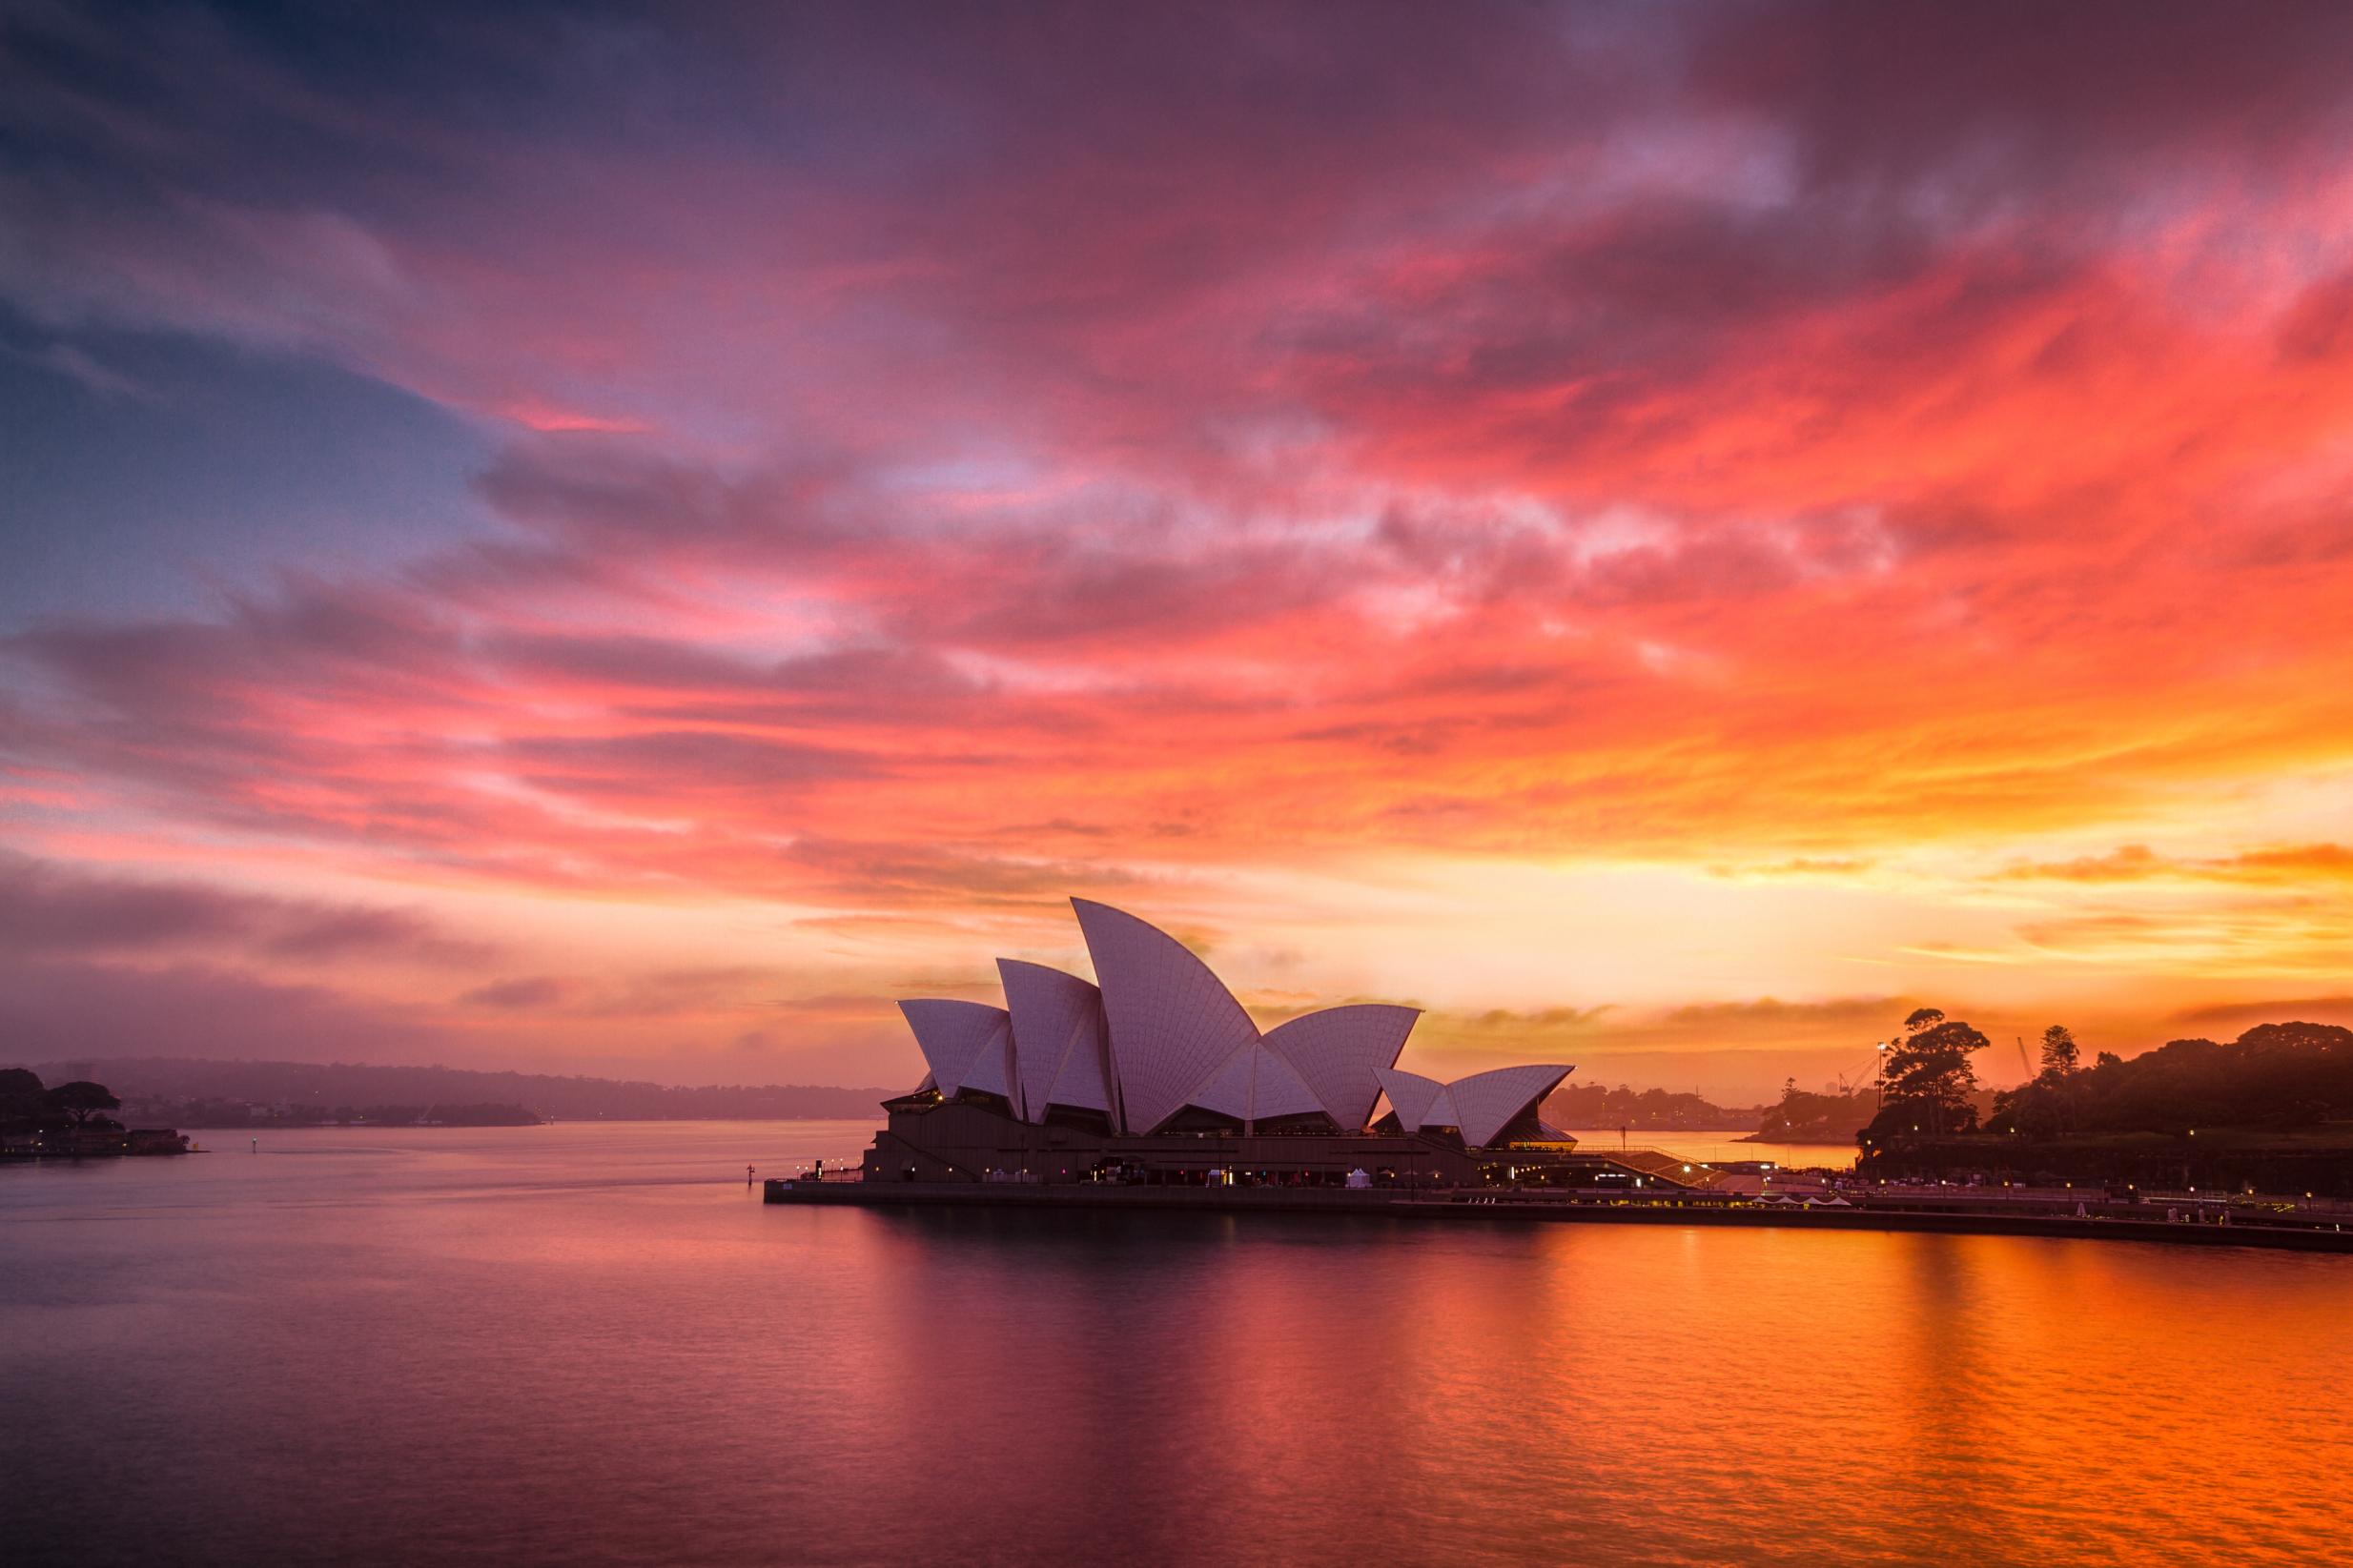 3c17824b0cf95d62bedb804736a7716c sydney opera house - 46+ Photos Of Sydney Opera House In Australia  Pictures